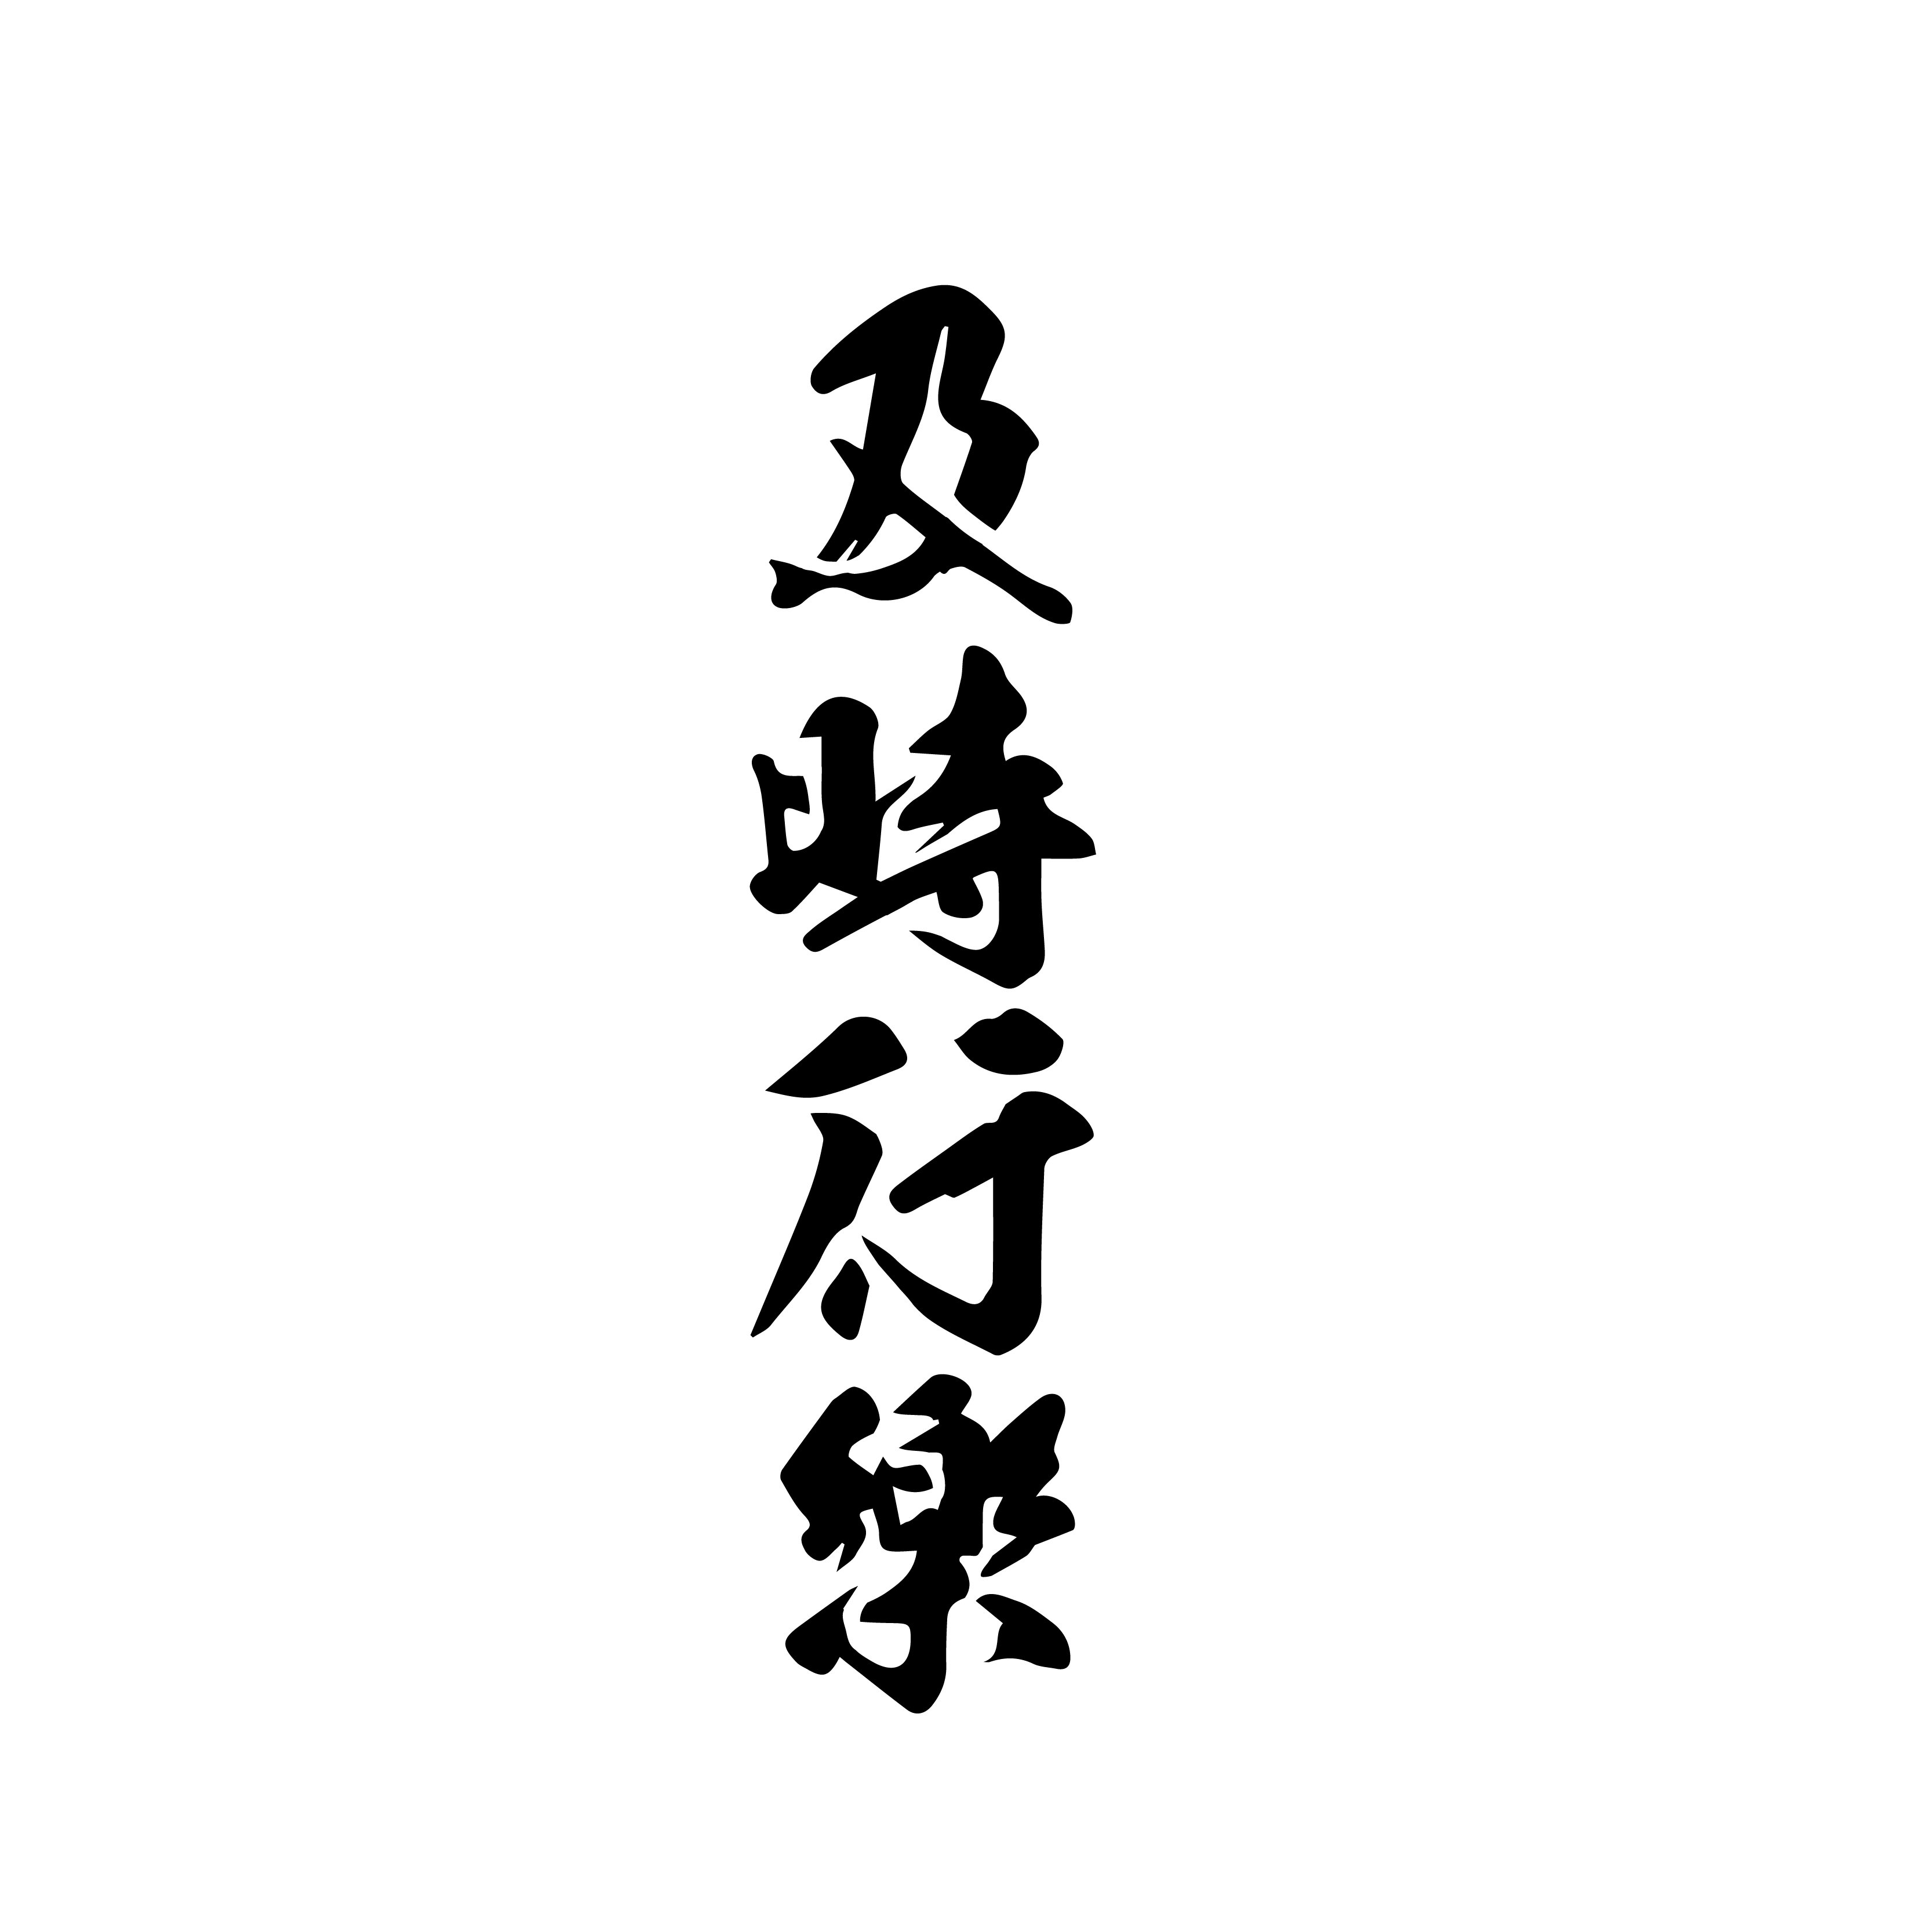 【inkbox】果汁纹身模板汉字 (v15)3.5*14.5cm 及时行乐